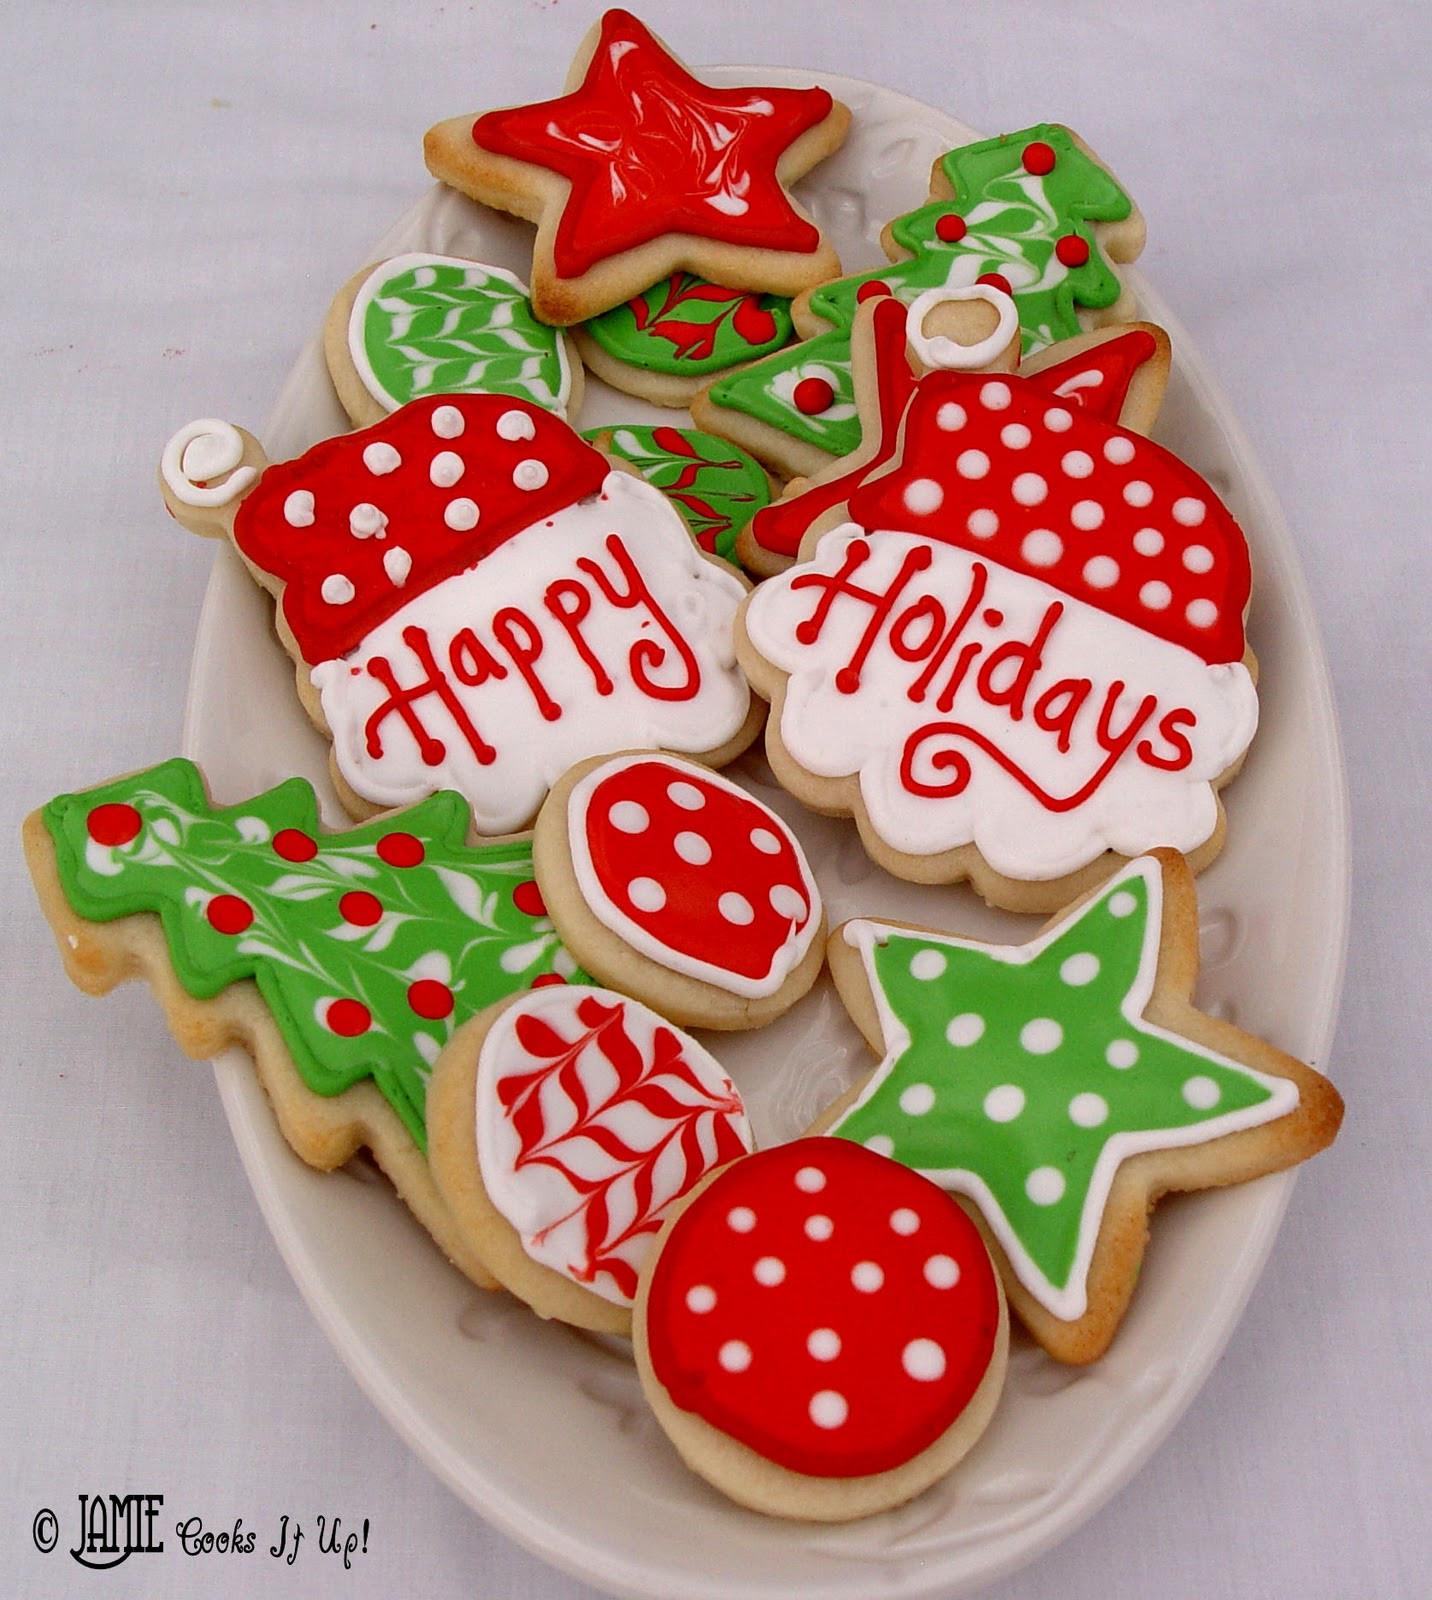 Christmas Sugar Cookies Recipe  Christmas Sugar Cookies with Glaze Icing